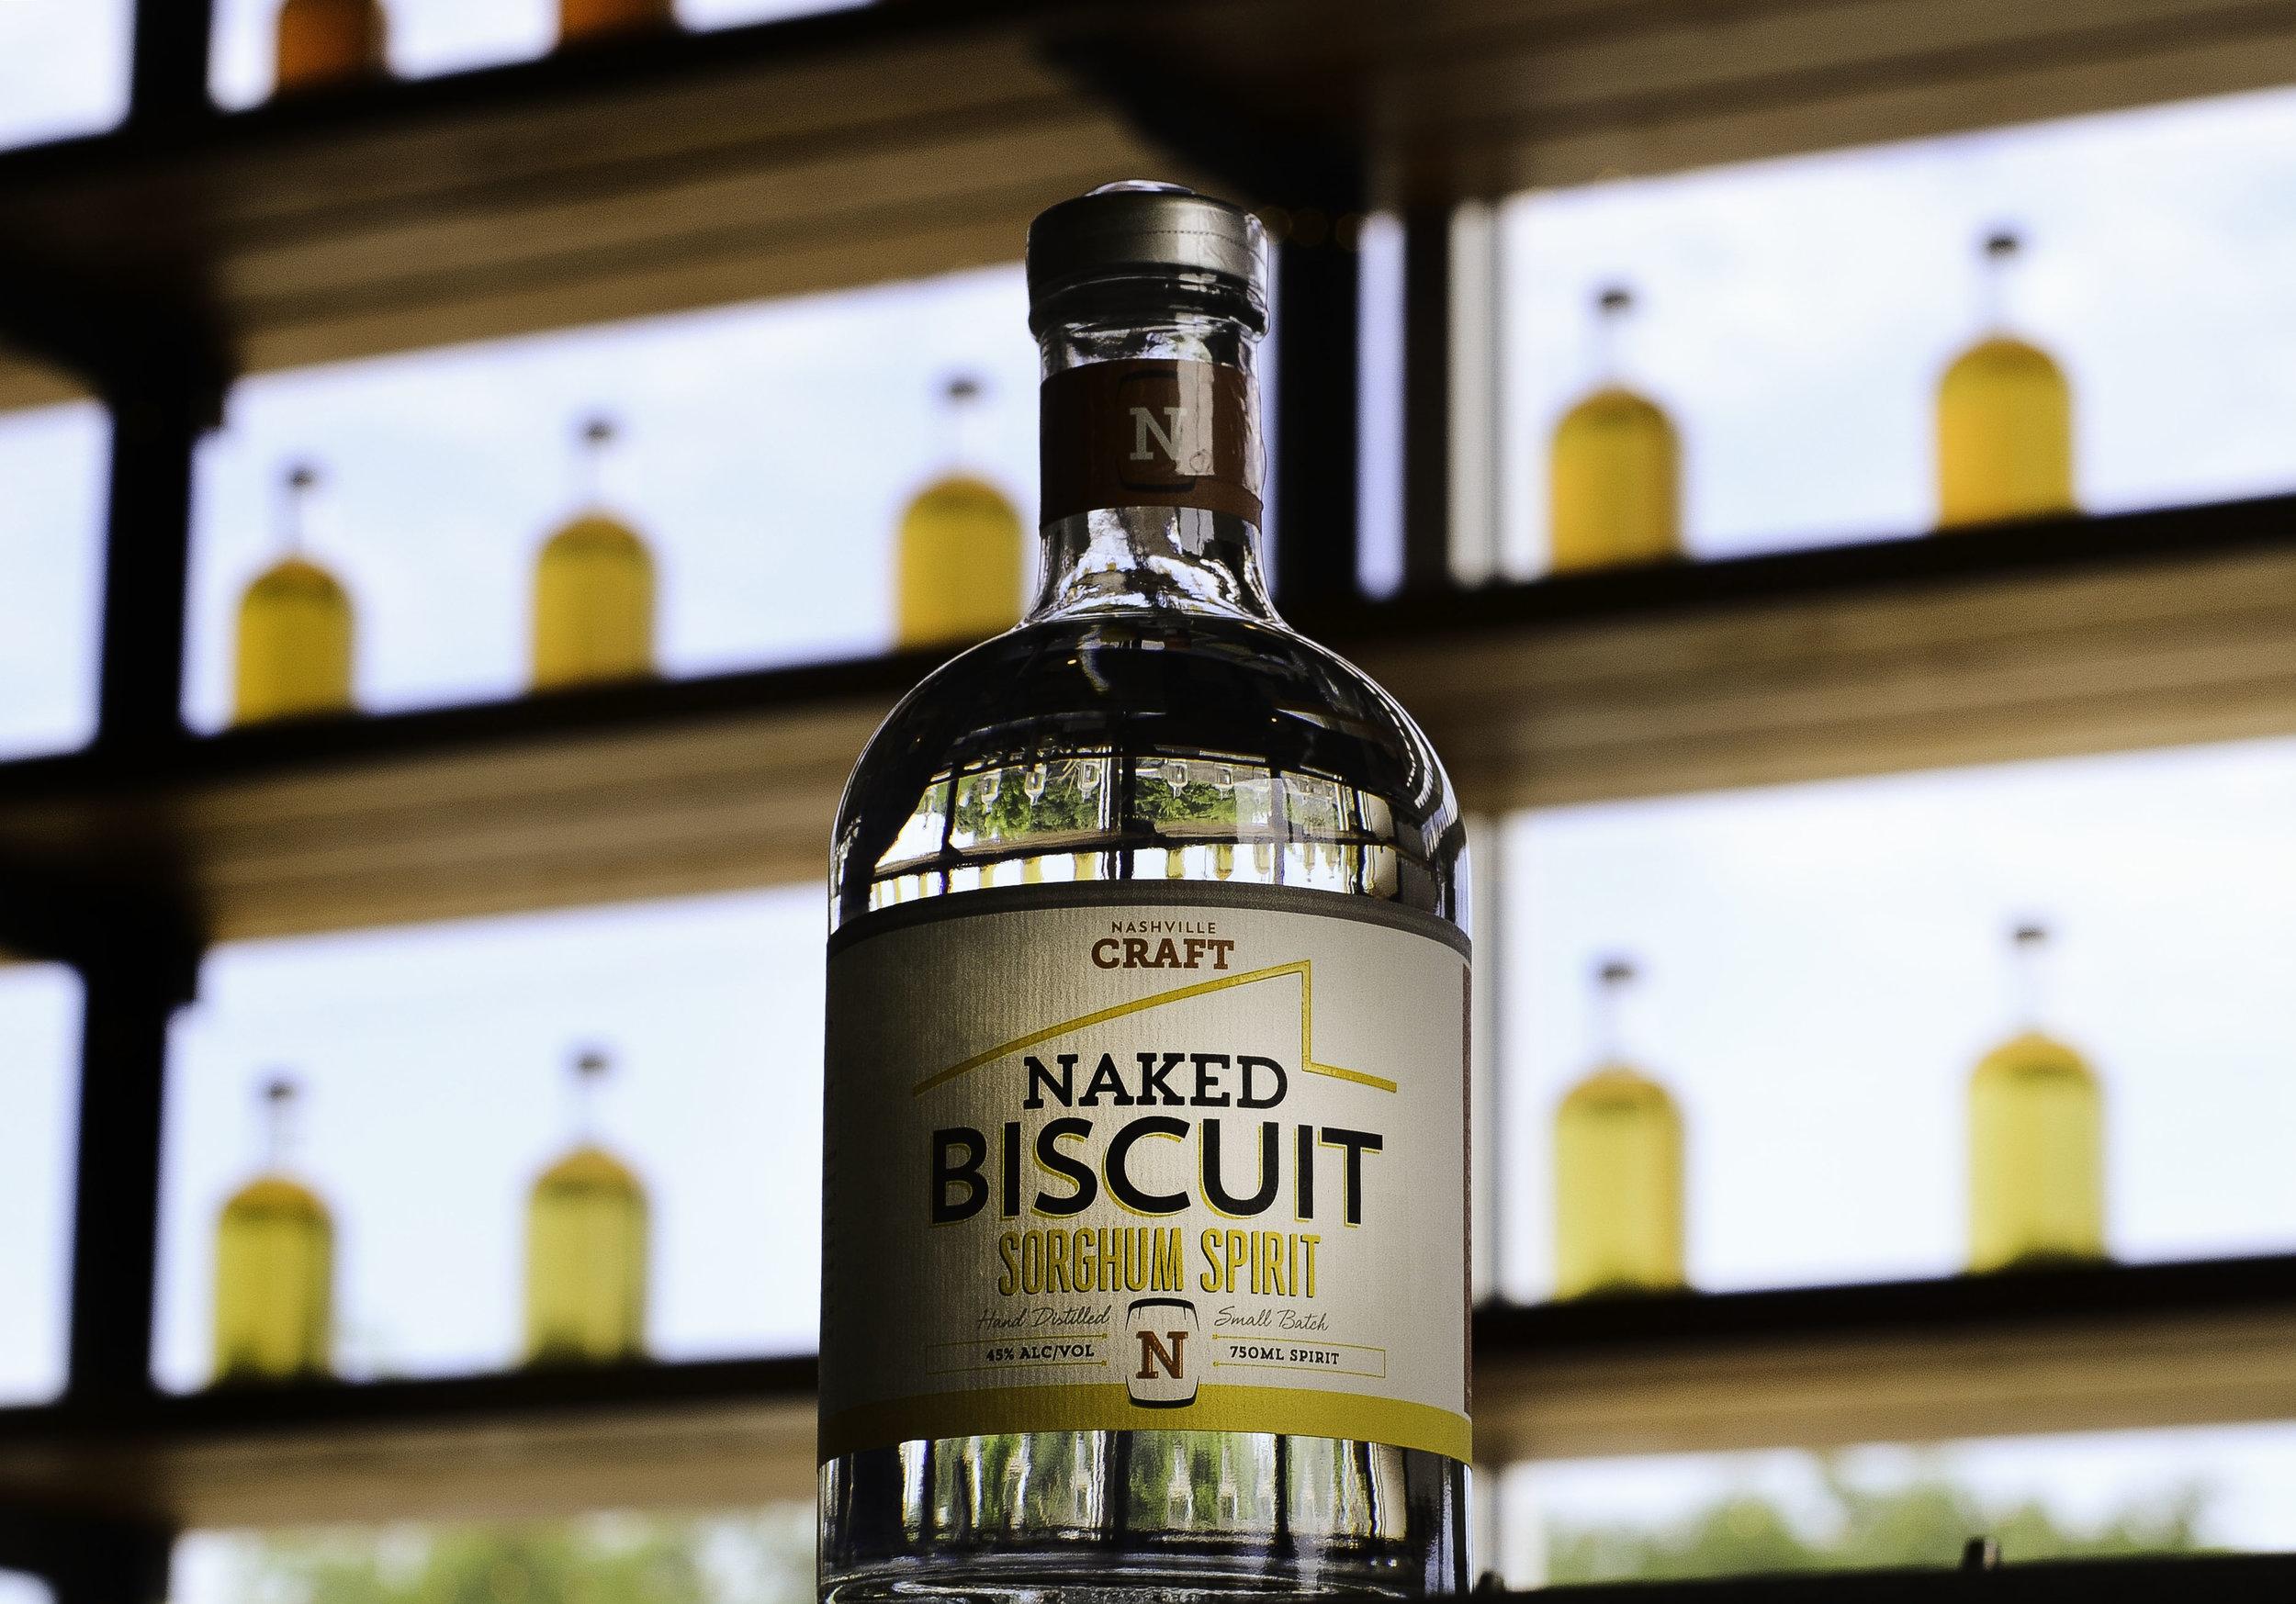 Naked Biscuit Sorghum Spirit at Nashville Craft